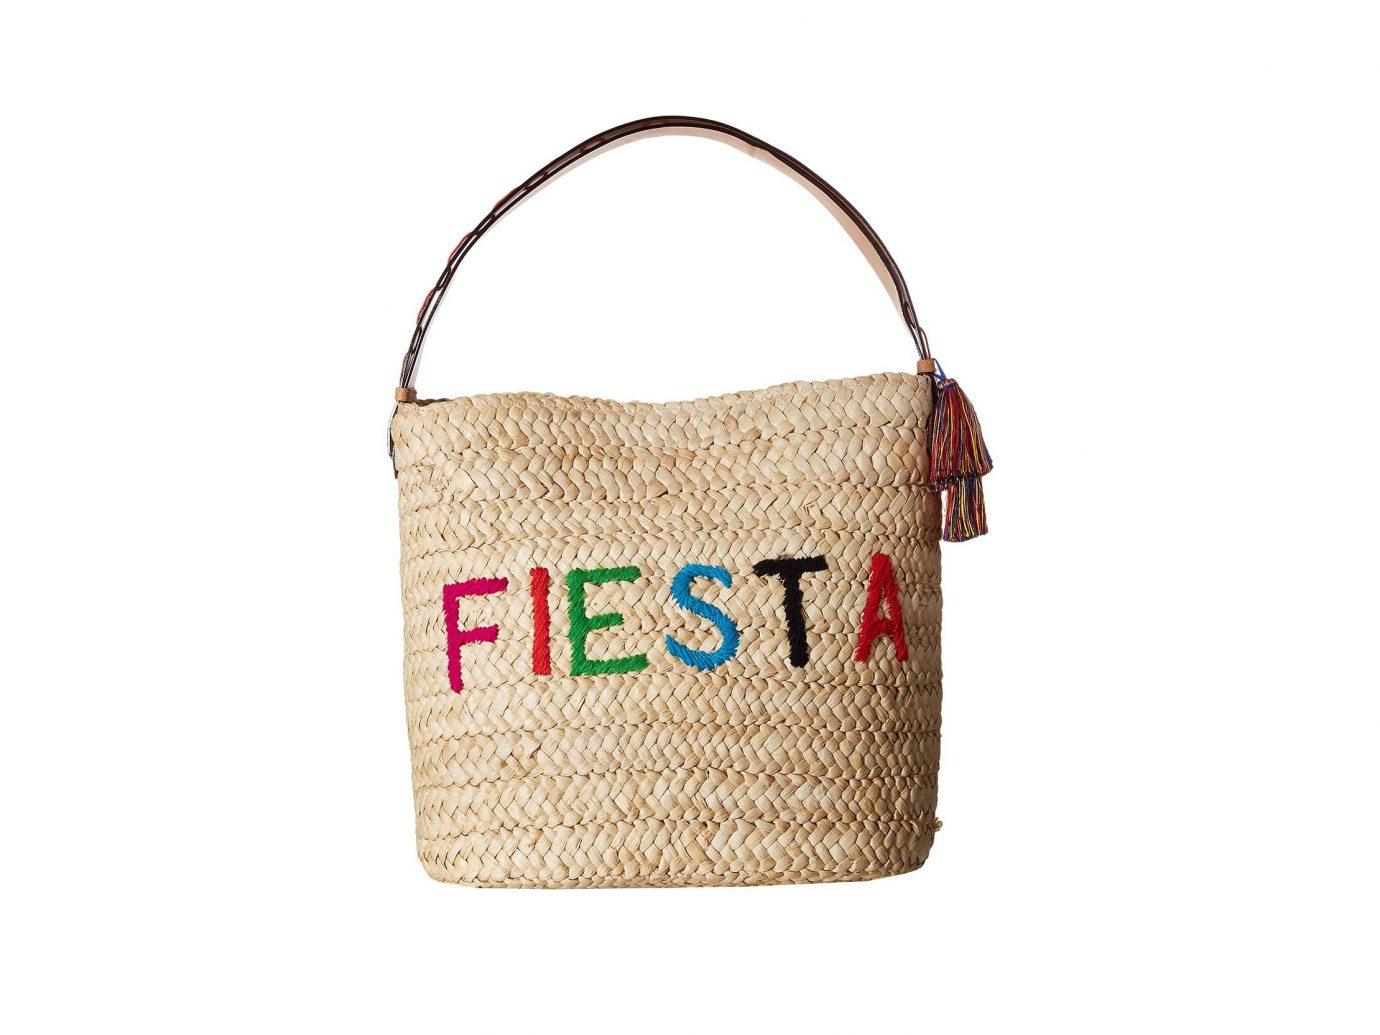 Frances Valentine Fiesta/Siesta Bag